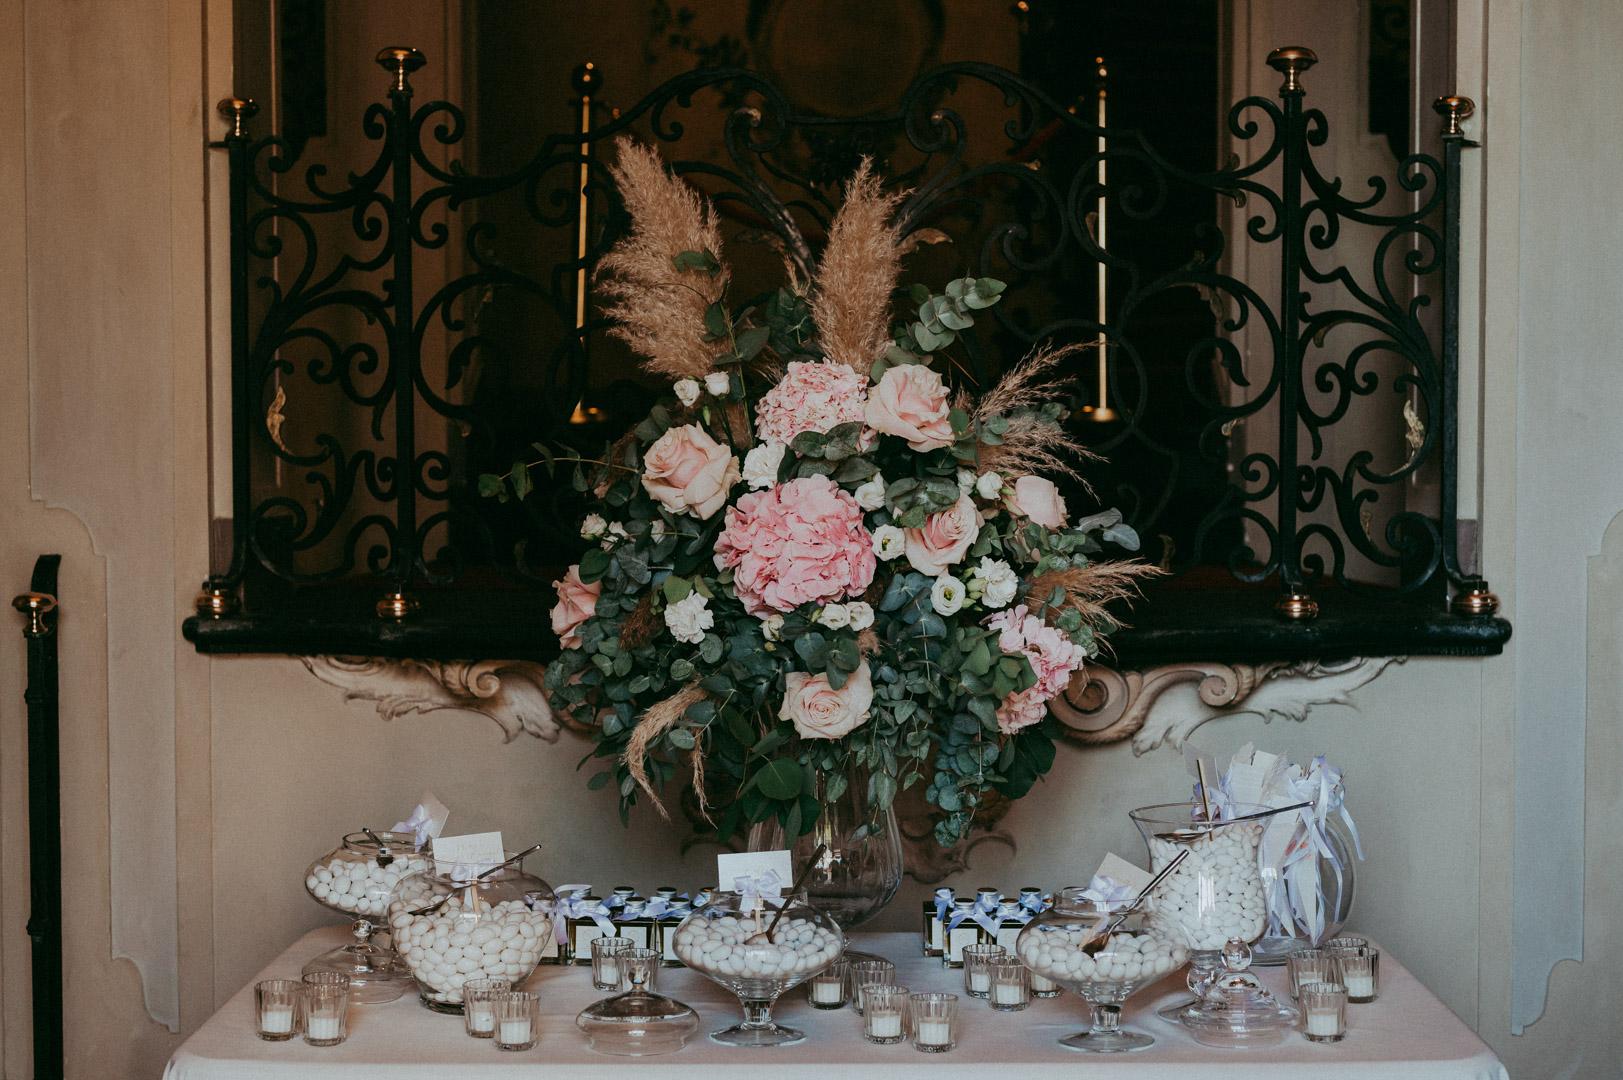 historic villa - SugarEvents Luxury Wedding and Event Planner